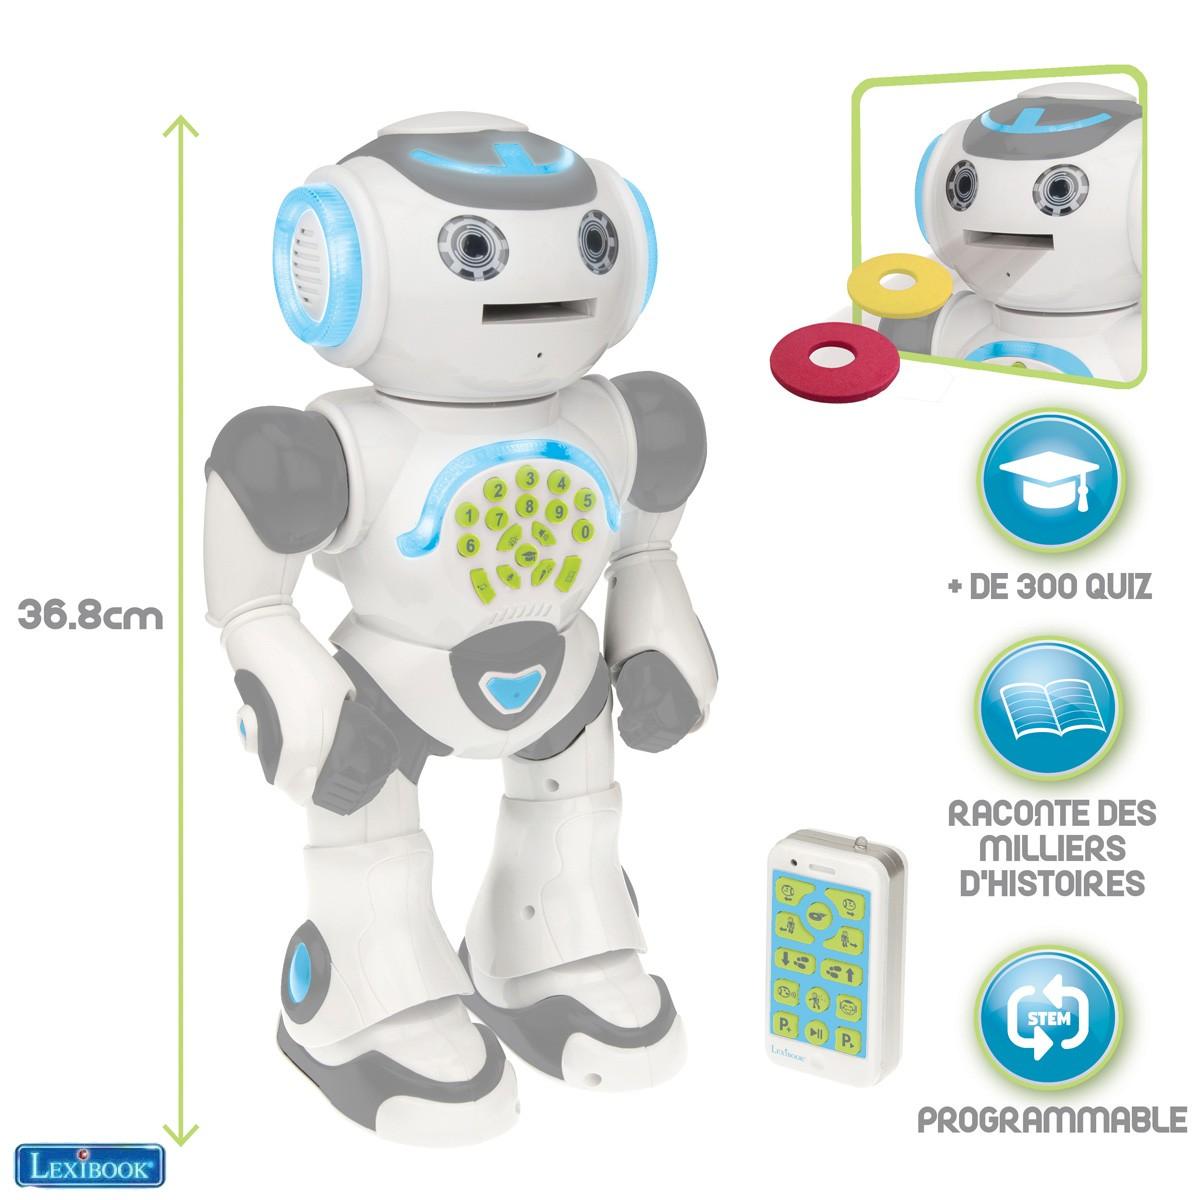 Robot éducatif & programmable POWERMAN® MAX